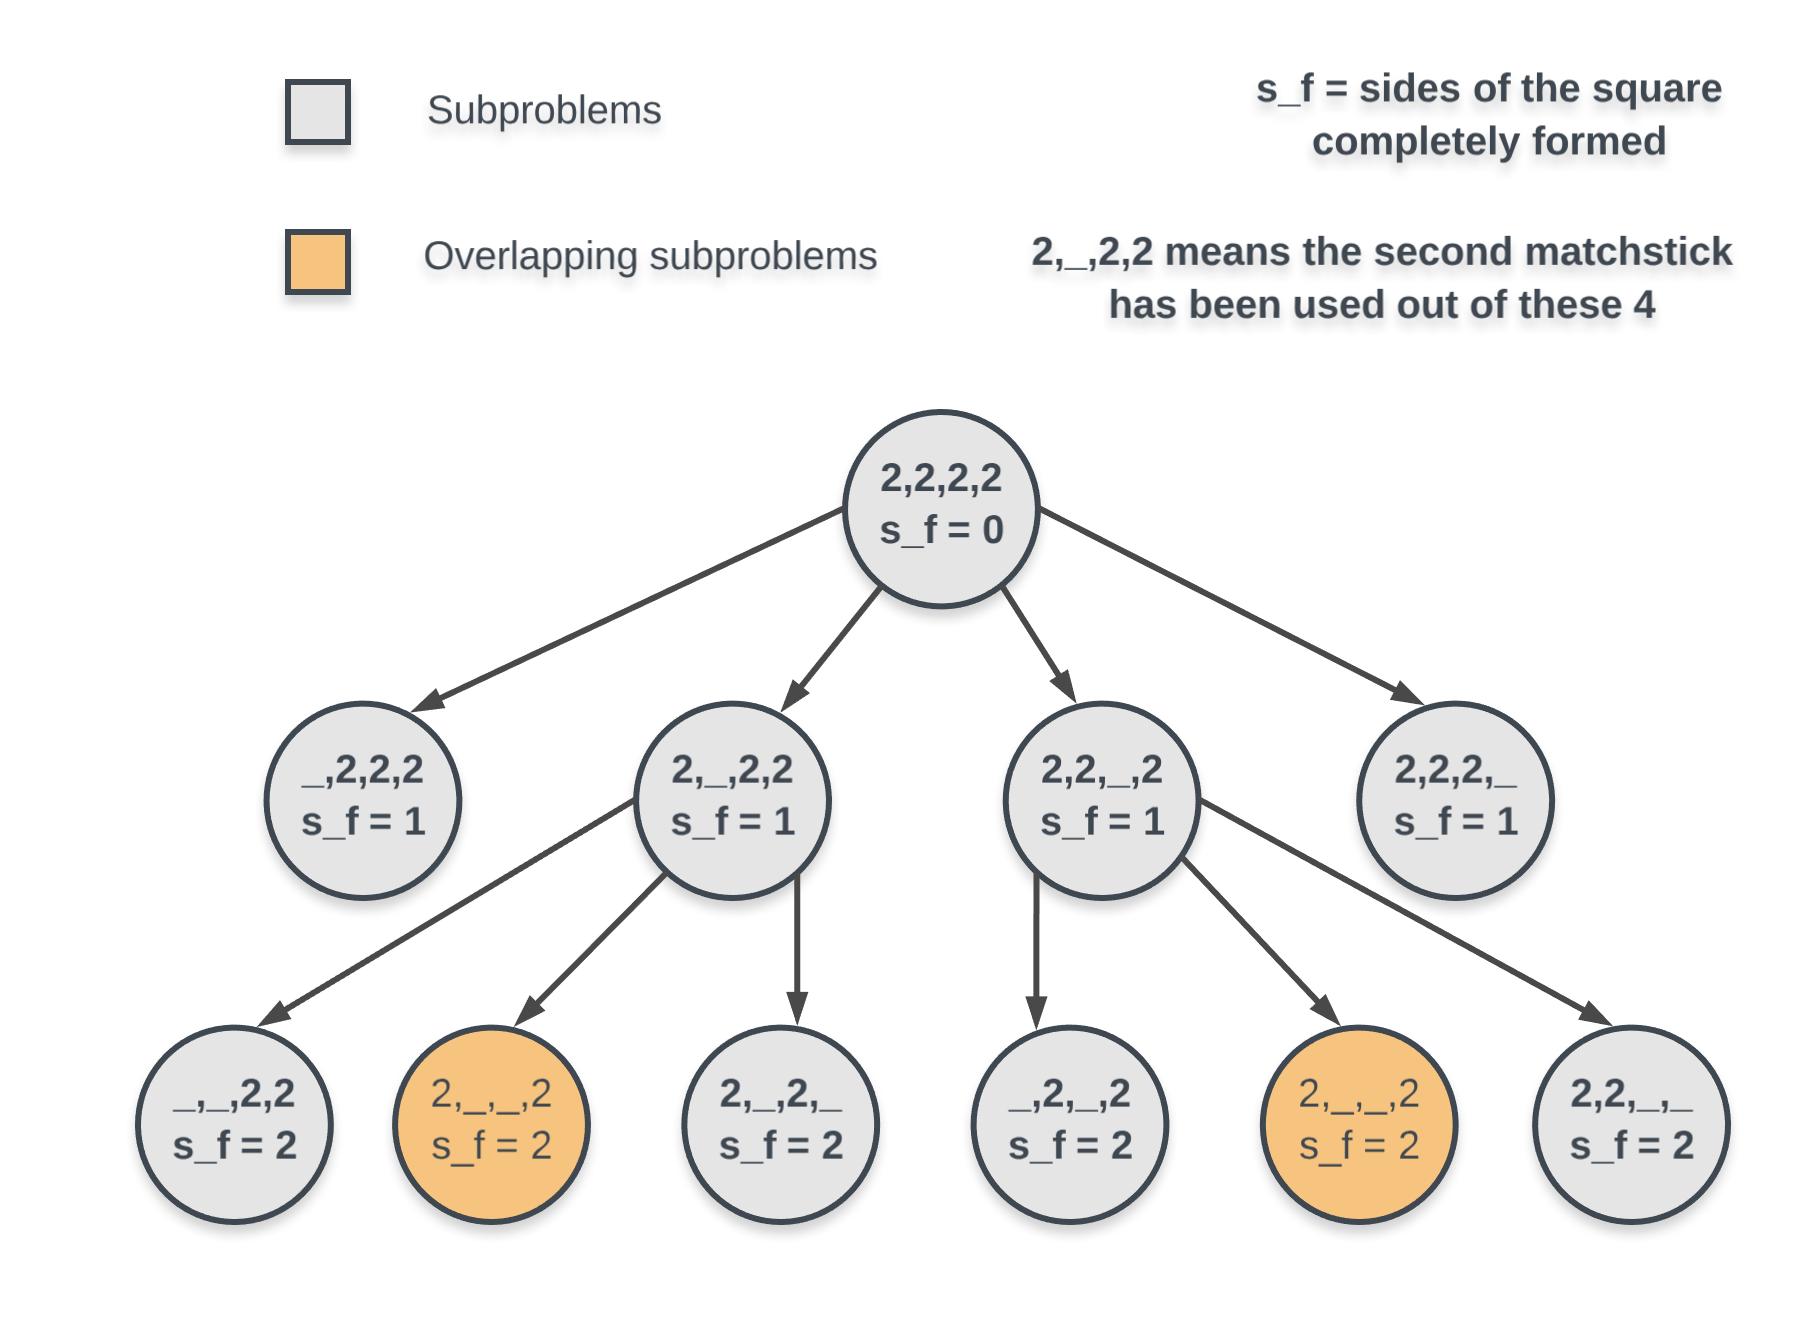 Massive Algorithms: LeetCode 473 - Matchsticks to Square